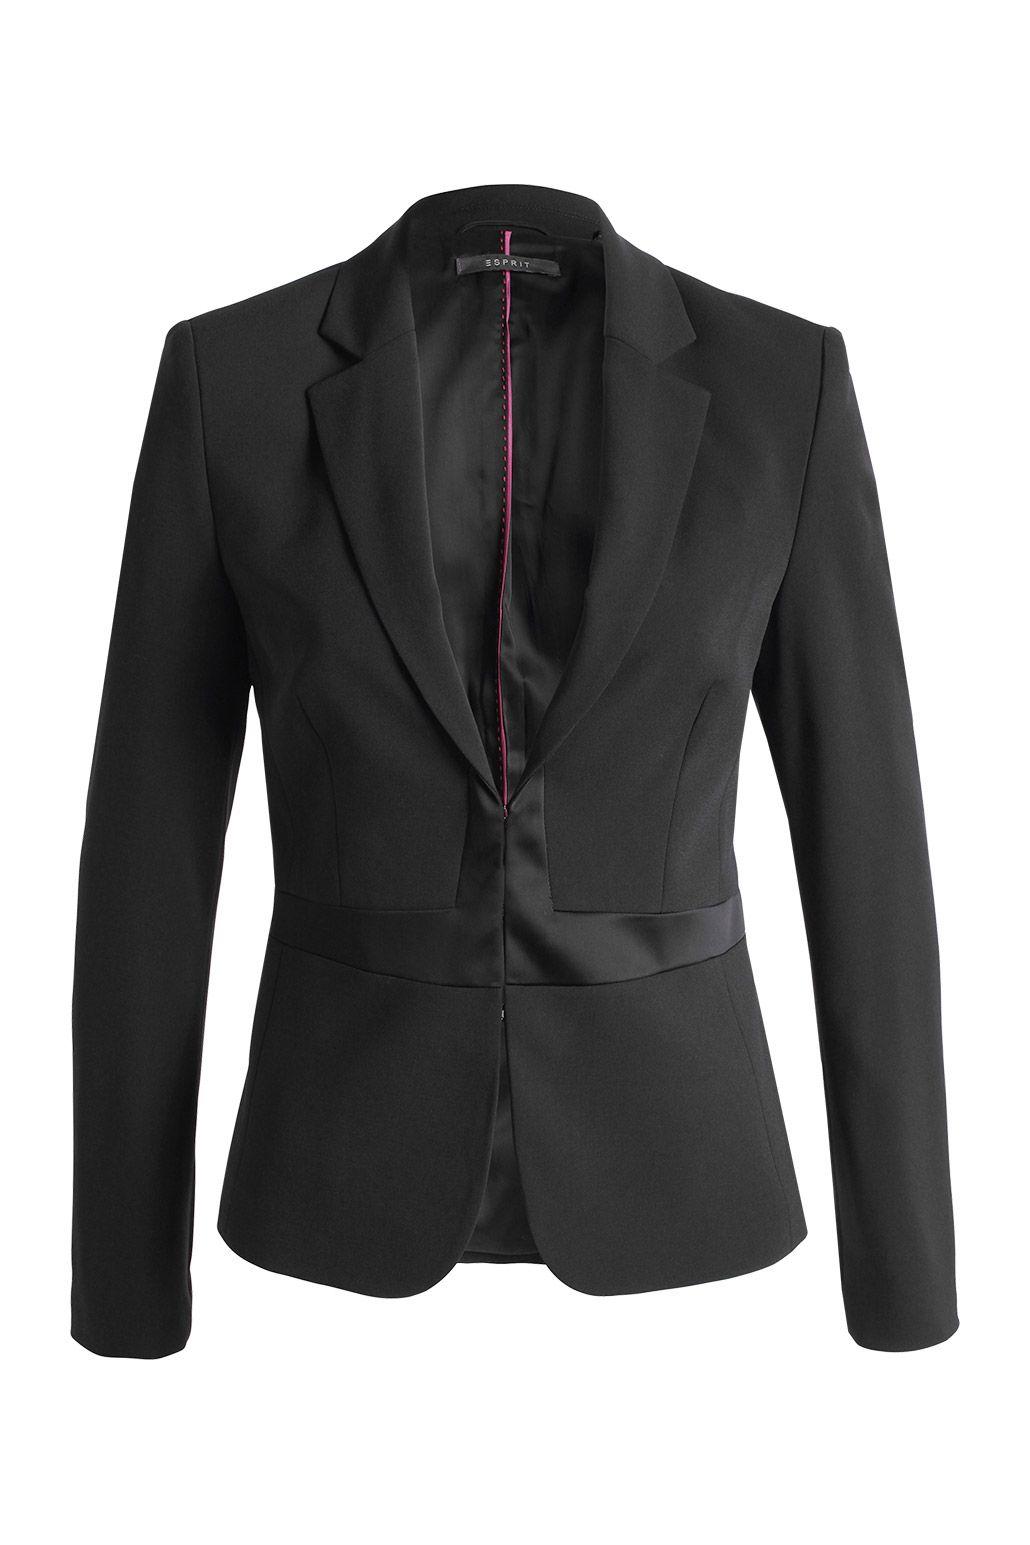 Elegant crêpe #blazer by #Esprit